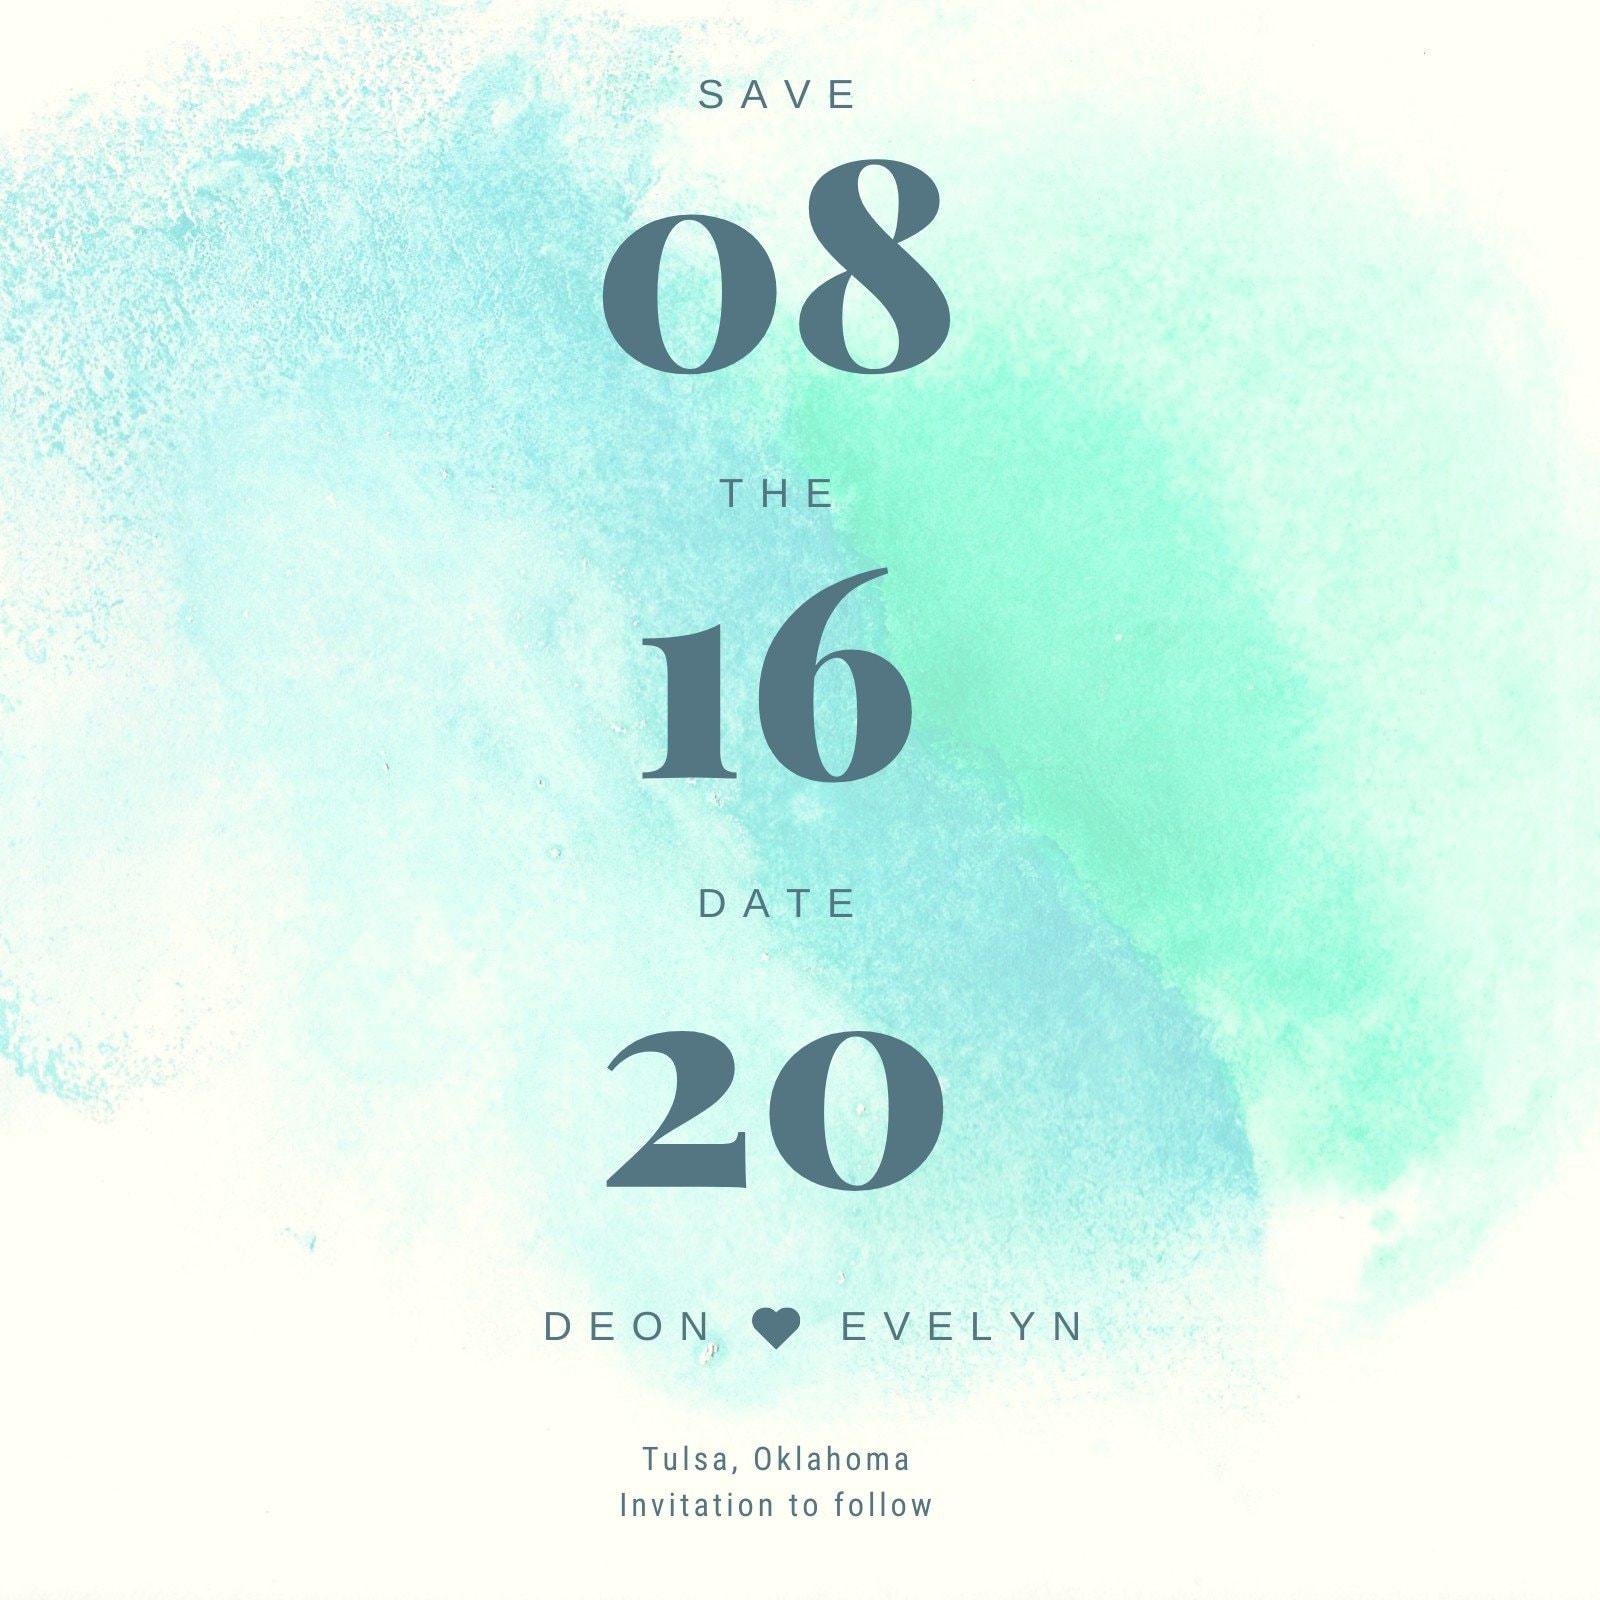 Wedding Save the Date Invitation